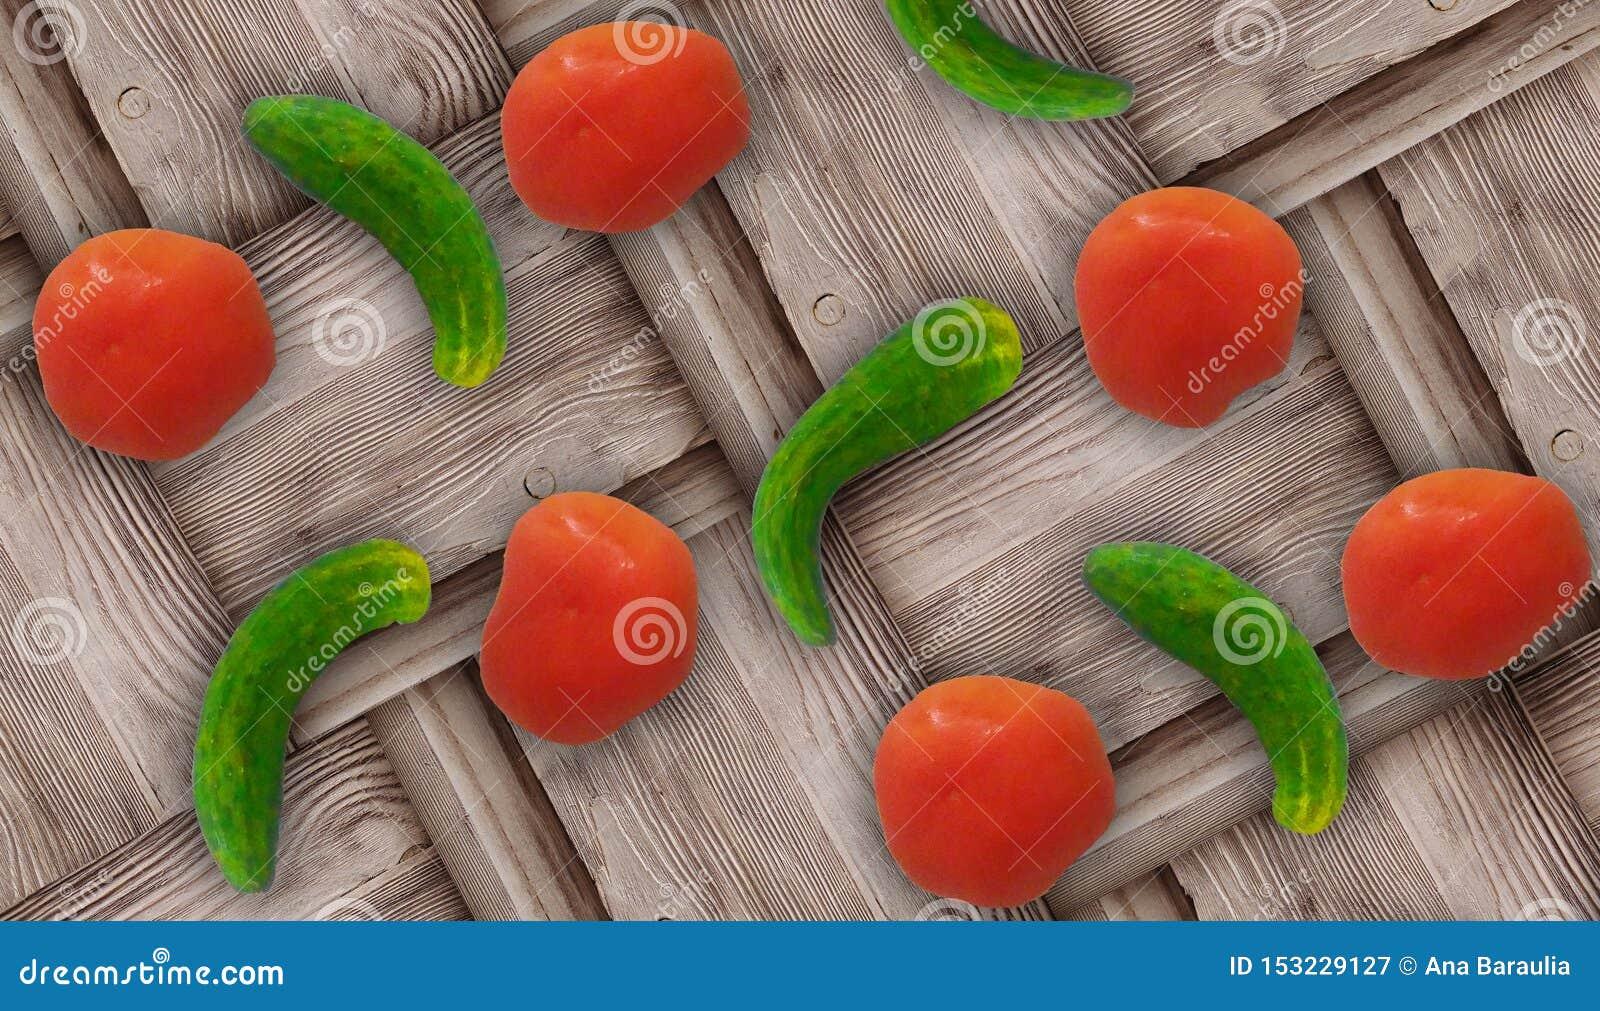 Verse lelijk croocked groene komkommers en verse rode tomaten op houten achtergrond